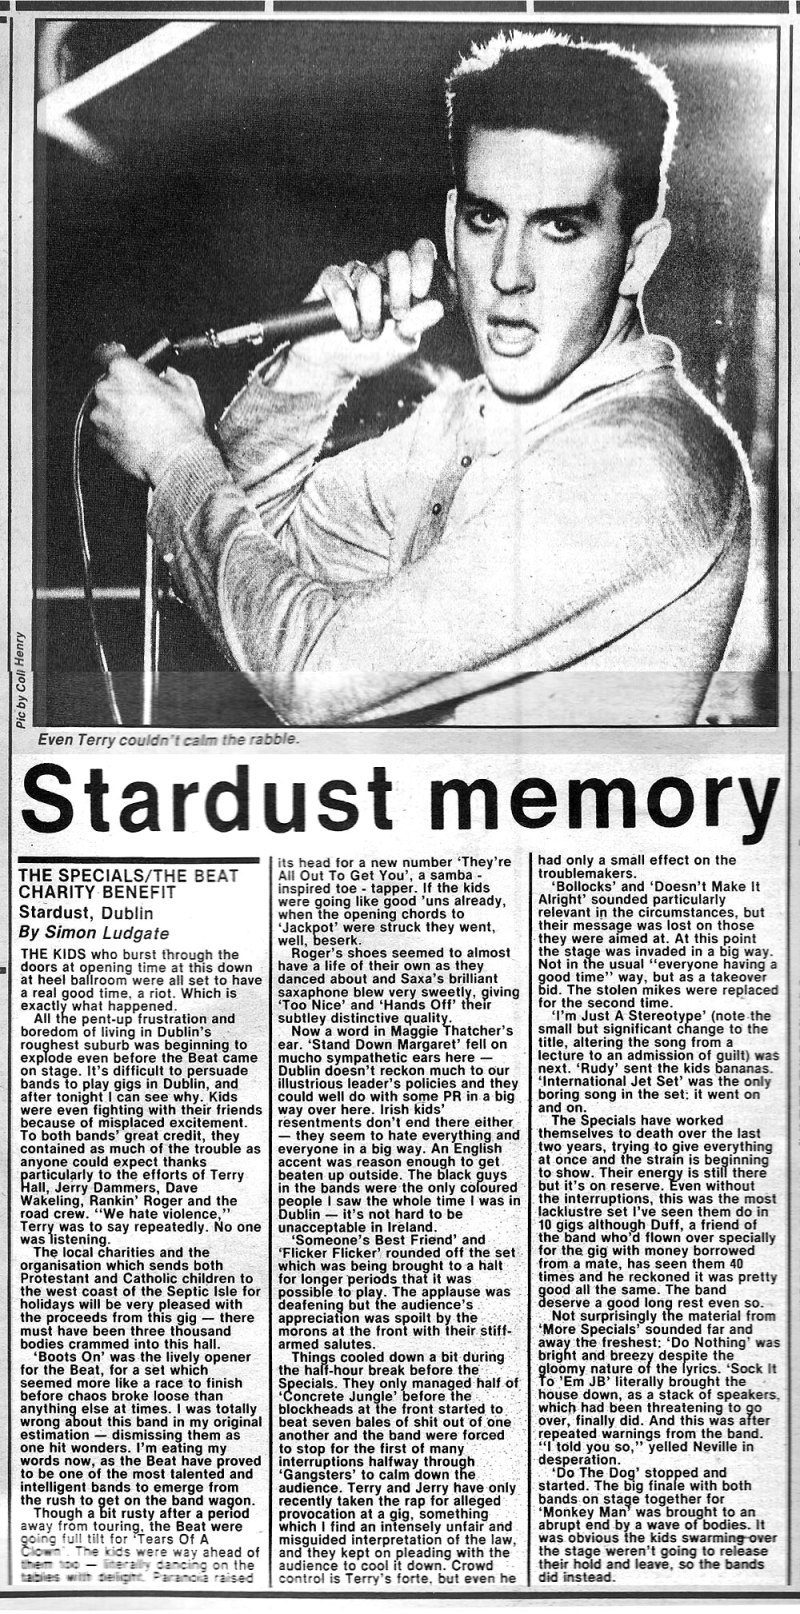 terry hall specials artane stardust ballroom jan 1981